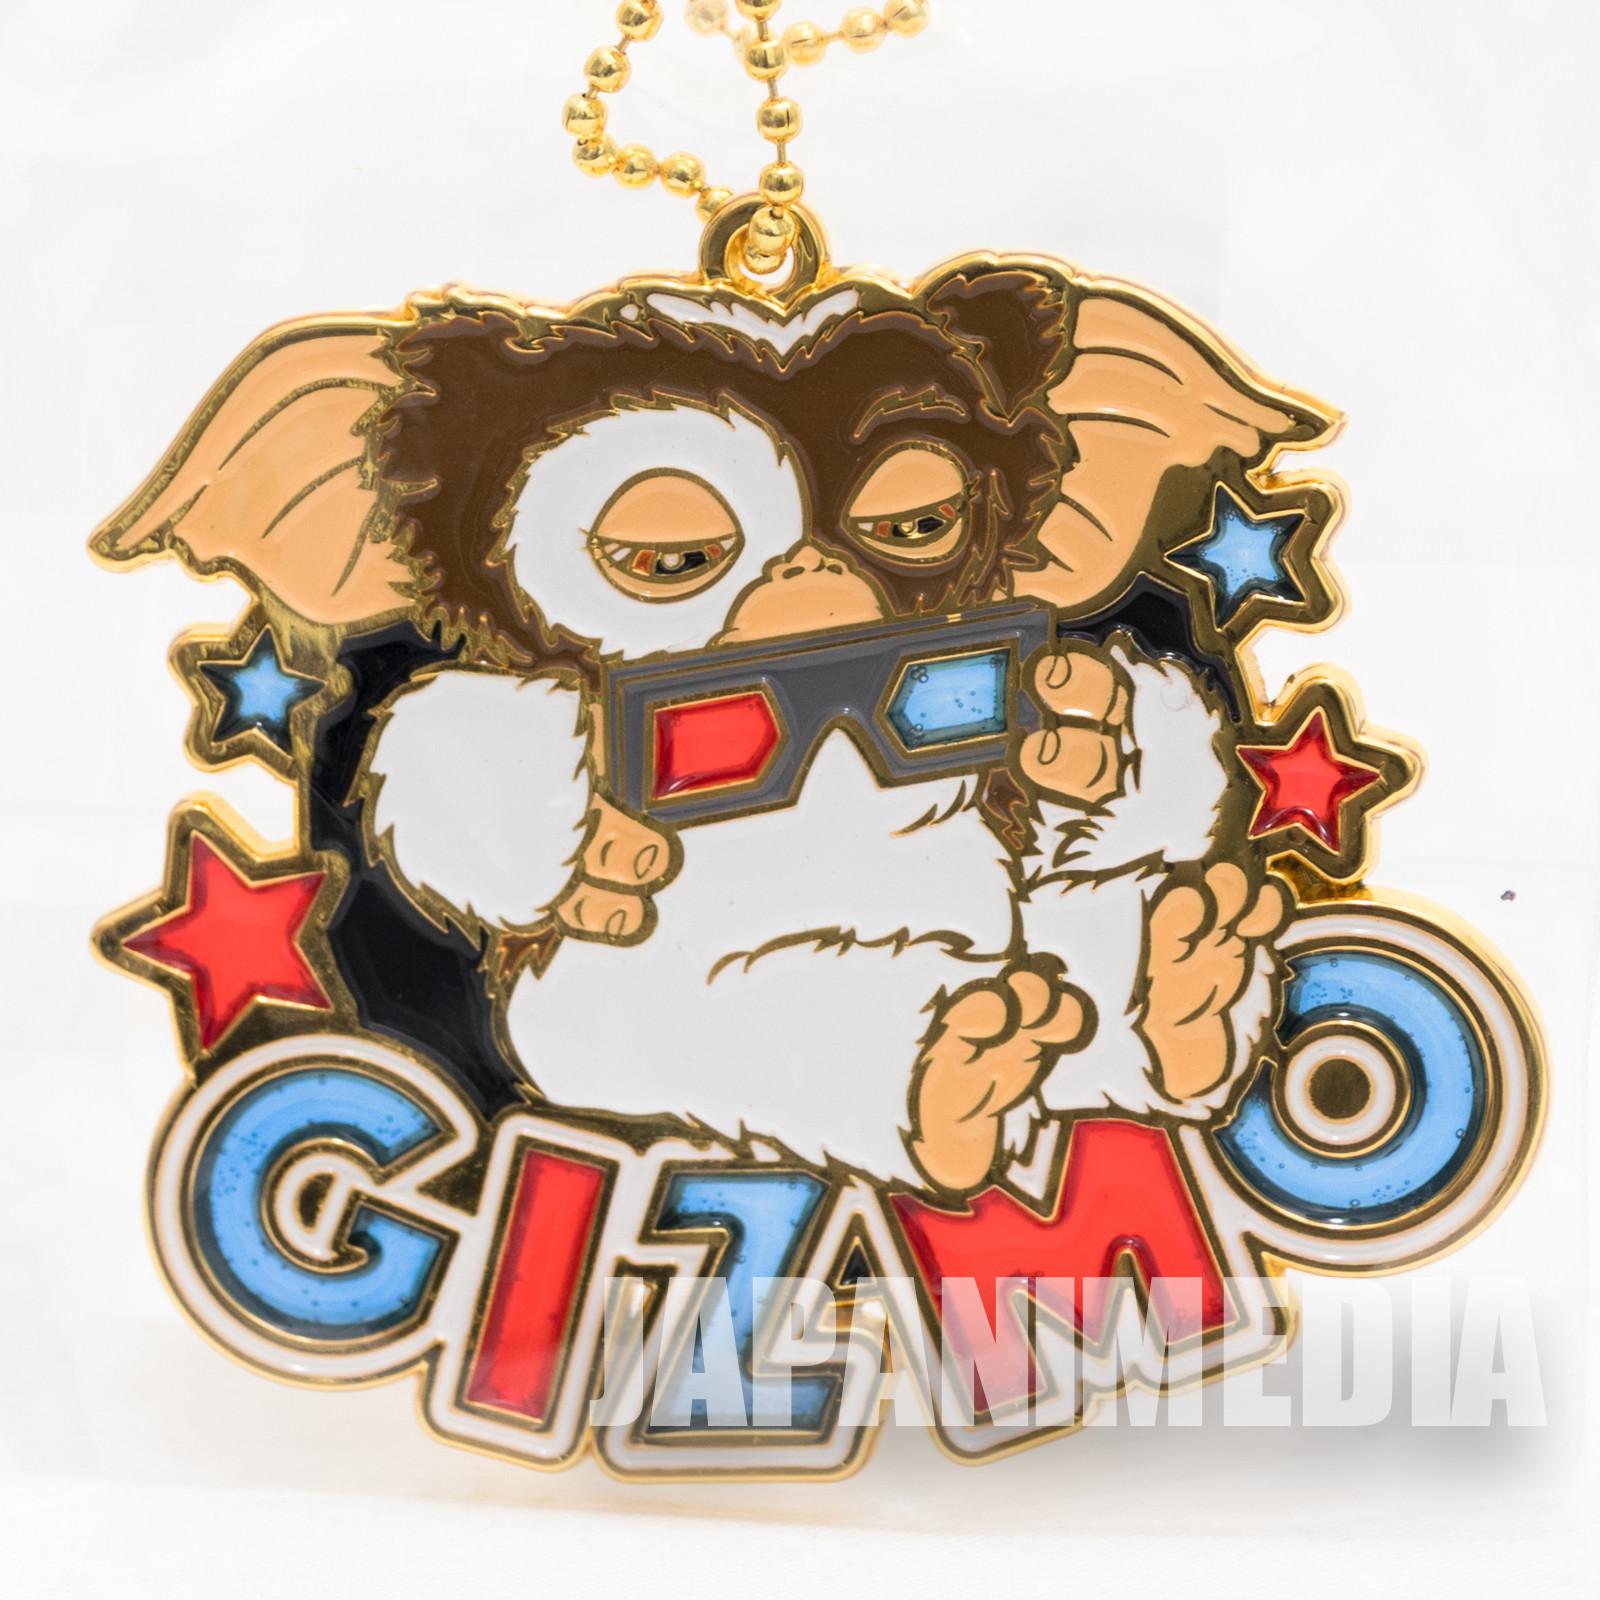 Gremlins Gizmo Metal Mascot Charm Ballchain #4 SK JAPAN